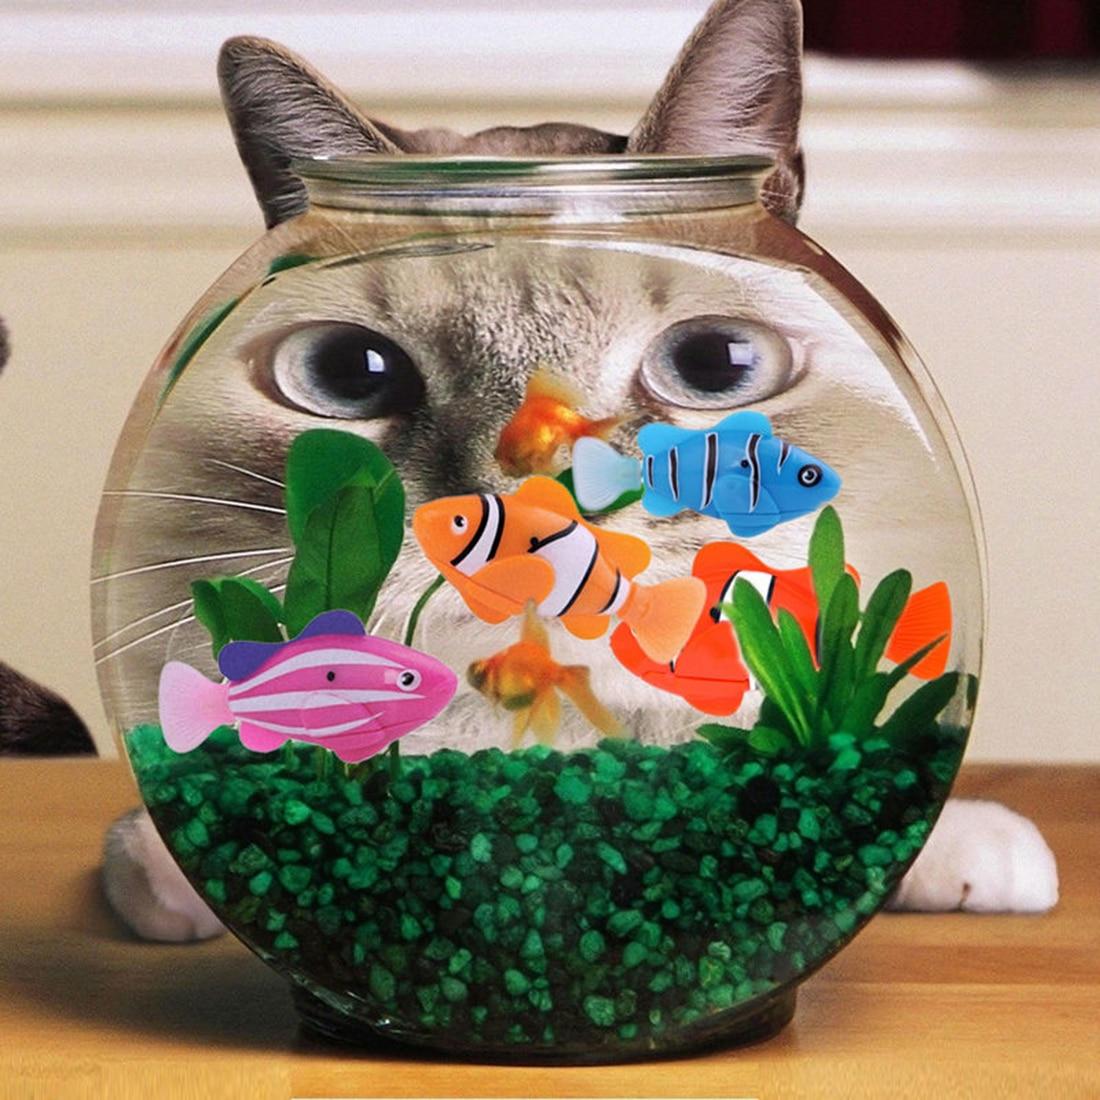 Aquarium fish tank cheap - Latest Robofish Activated Battery Powered Robo Fish Toy Fish Robotic Fish Tank Aquarium Ornaments Decorations